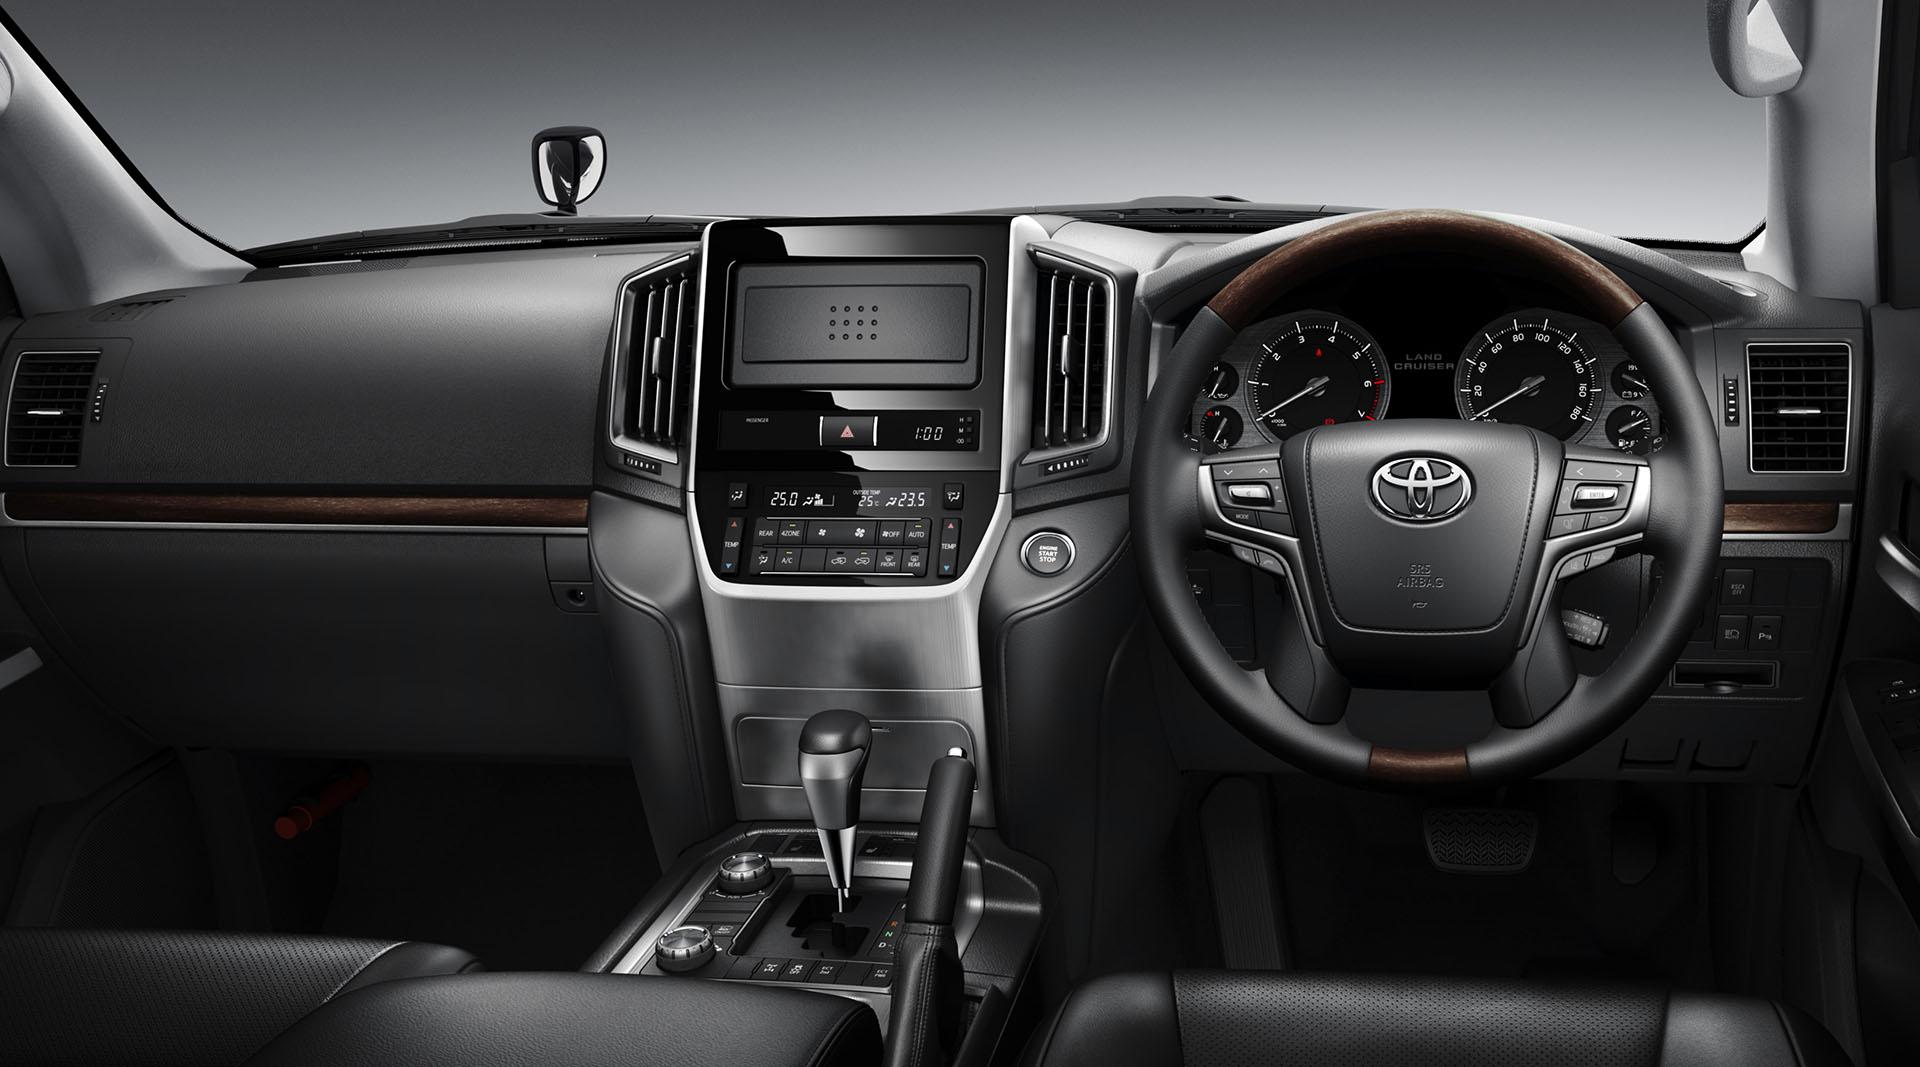 Toyota Land Cruiser 2016 interior - dashboard